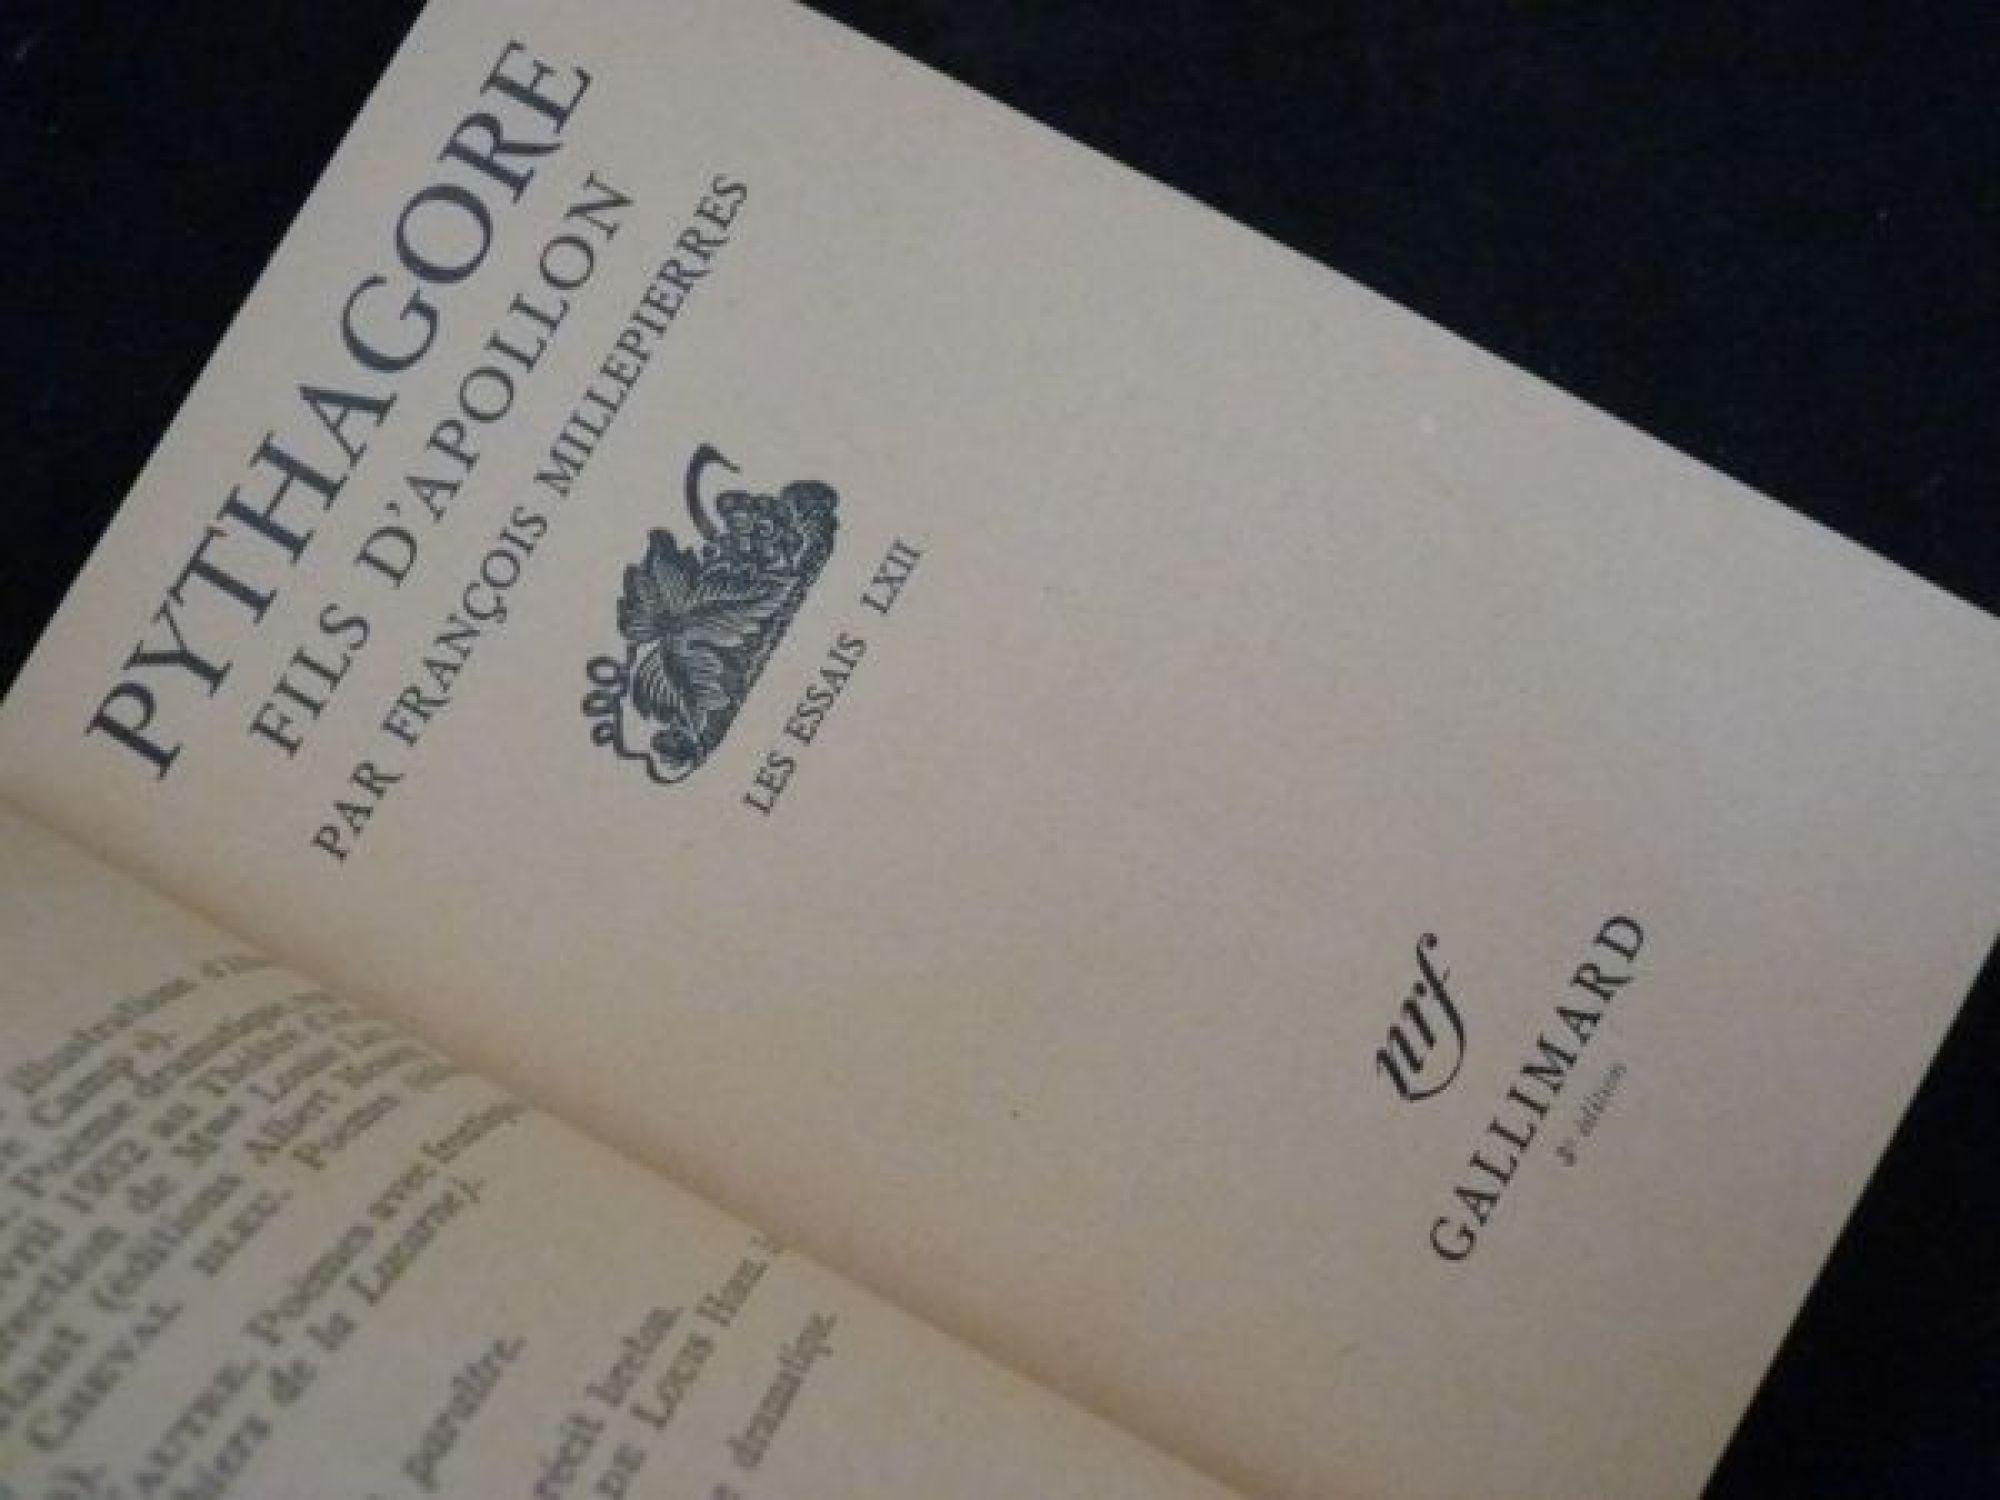 Edition Fils pythagore fils d apollon edition edition originale com